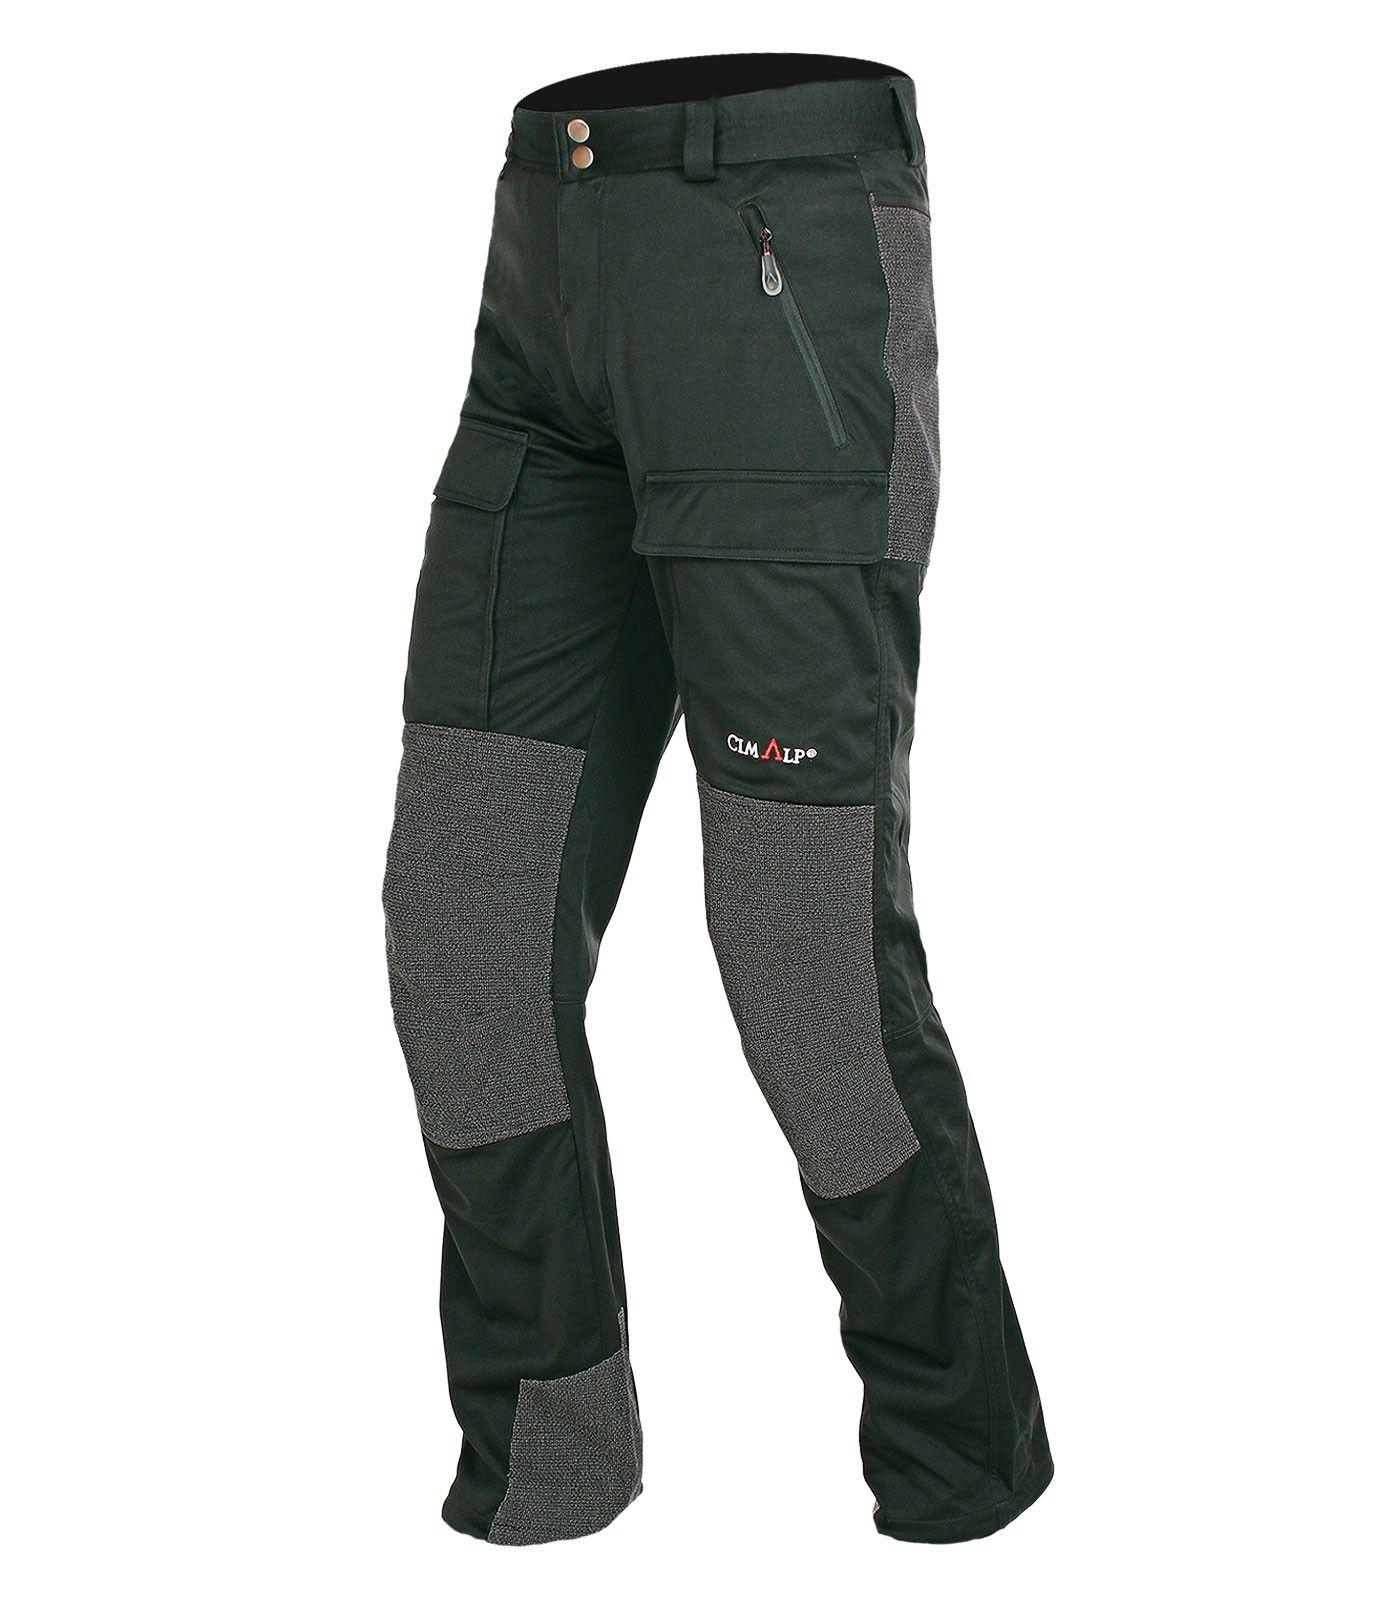 comment choisir un pantalon softshell d 39 alpinisme blog cimalp. Black Bedroom Furniture Sets. Home Design Ideas